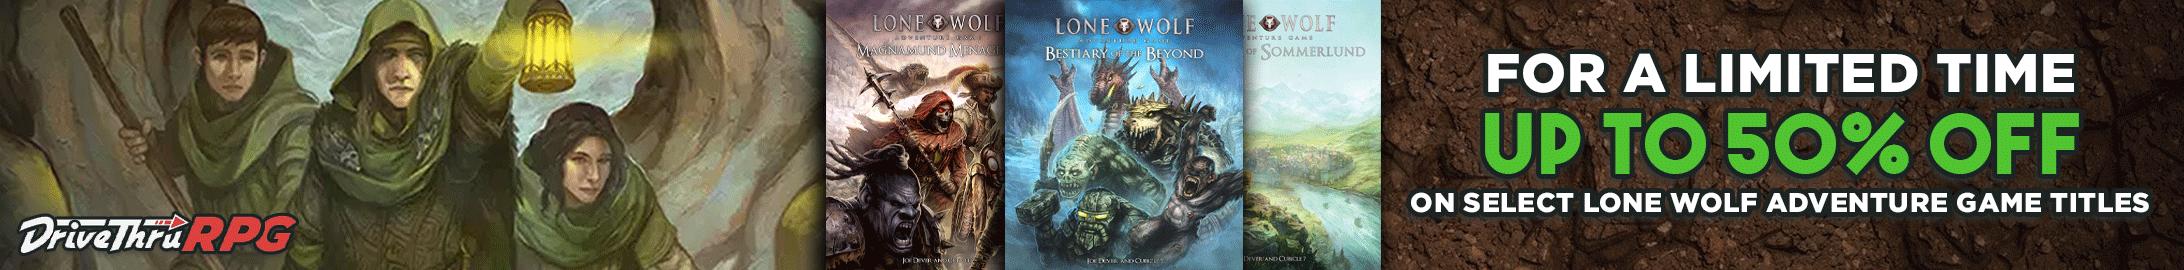 Lone Wolf Last Chance Banner